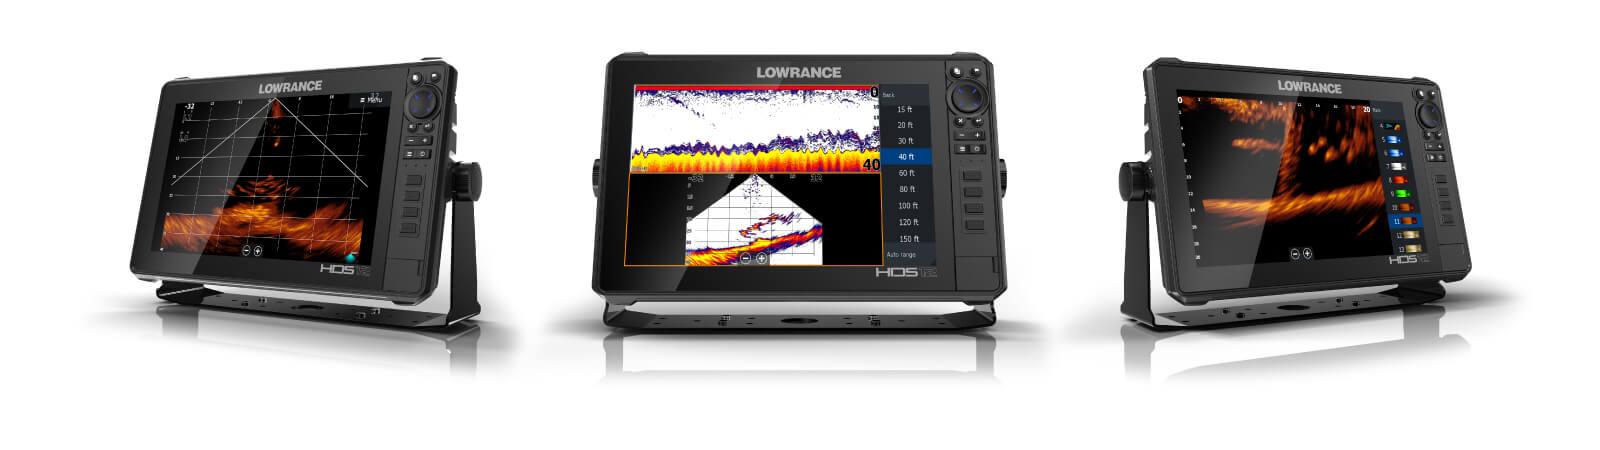 Lowrance LiveSight Transducer - livesight family hds